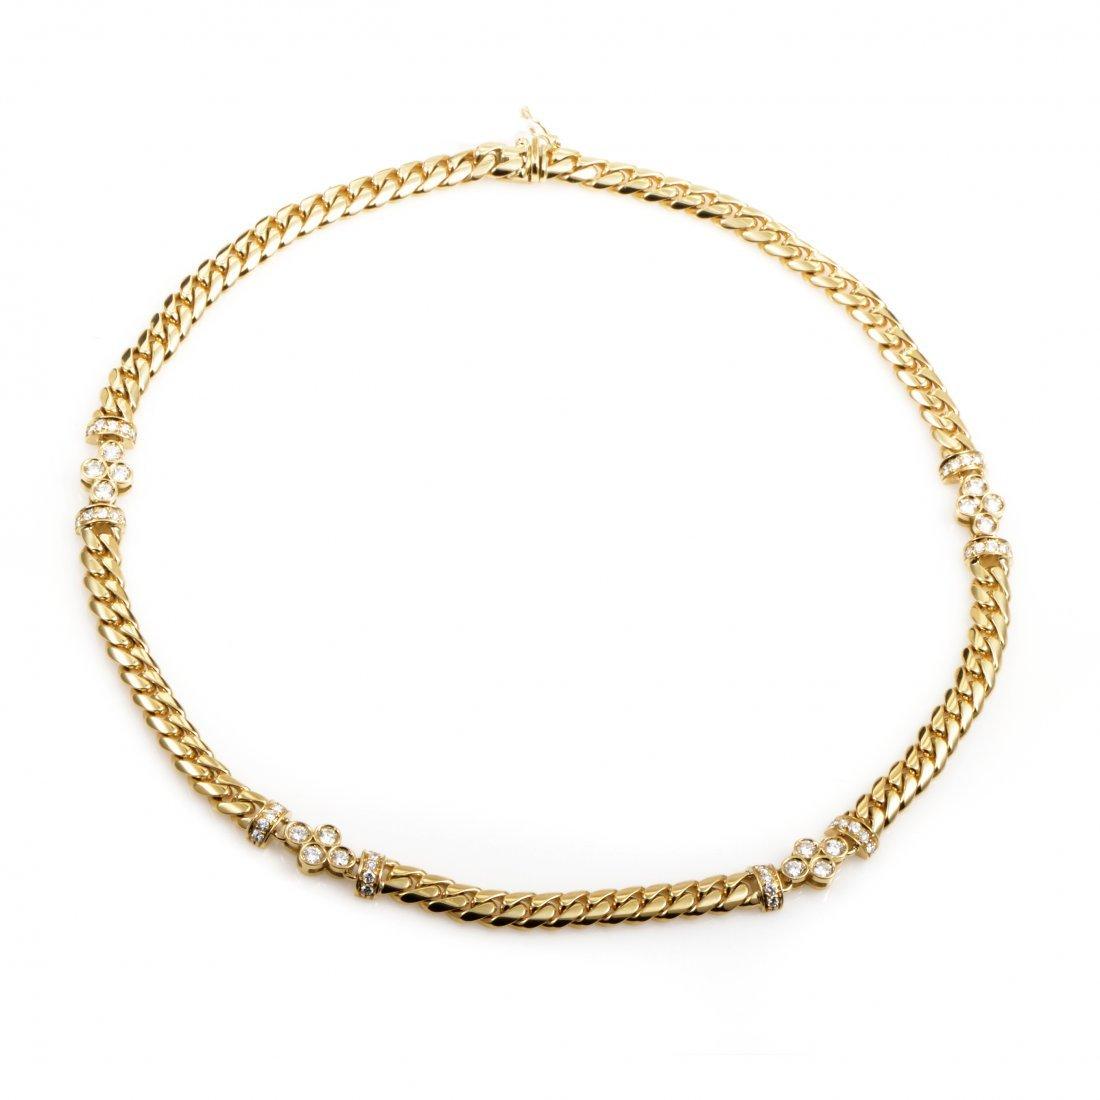 Vintage Bvlgari 18K Yellow Gold Diamond Collar Necklace